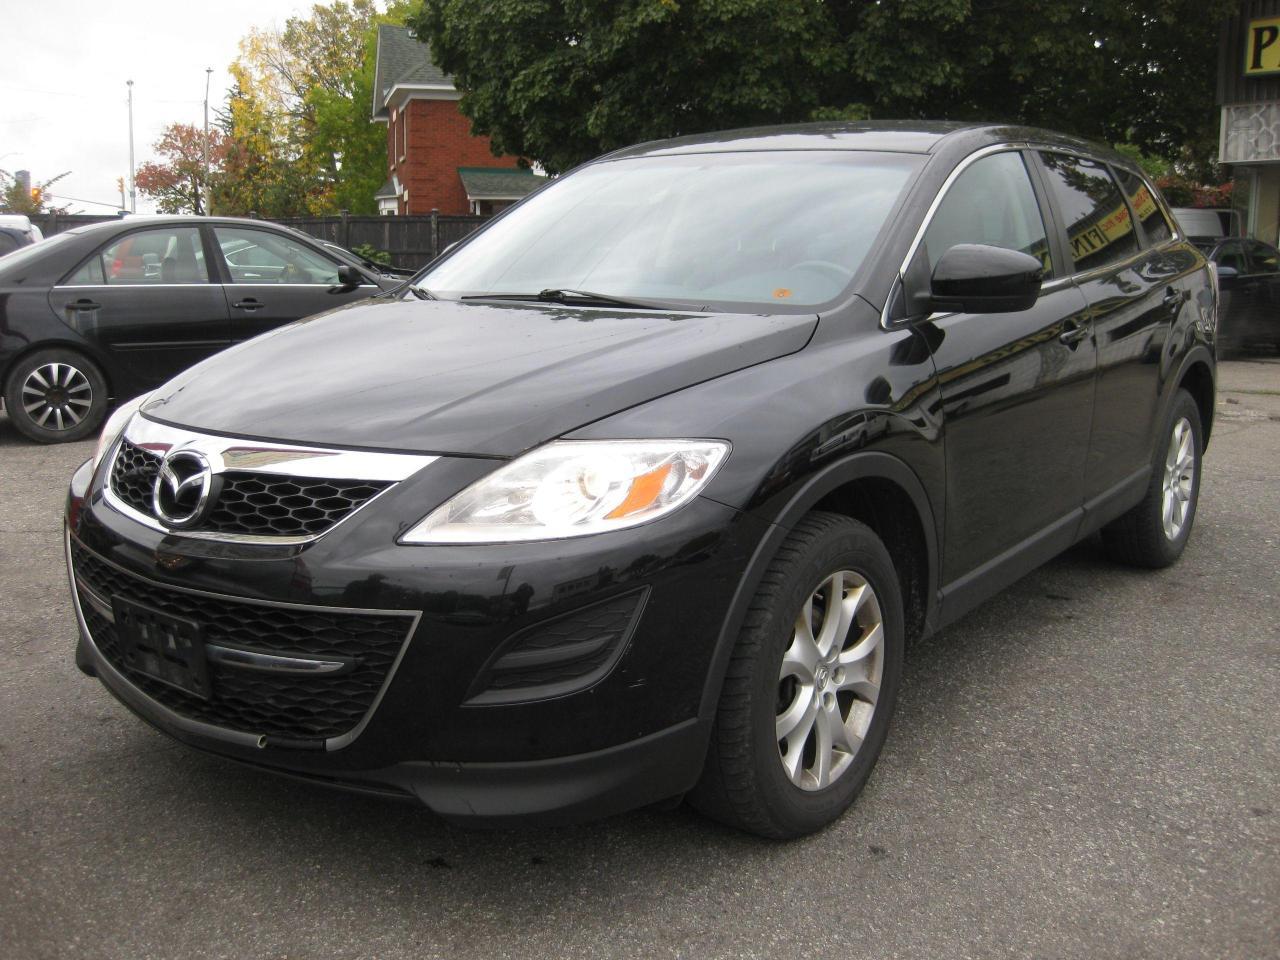 2012 Mazda CX-9 GS 3.7L 6cy AC Auto 7 pass PL PM PW Leather